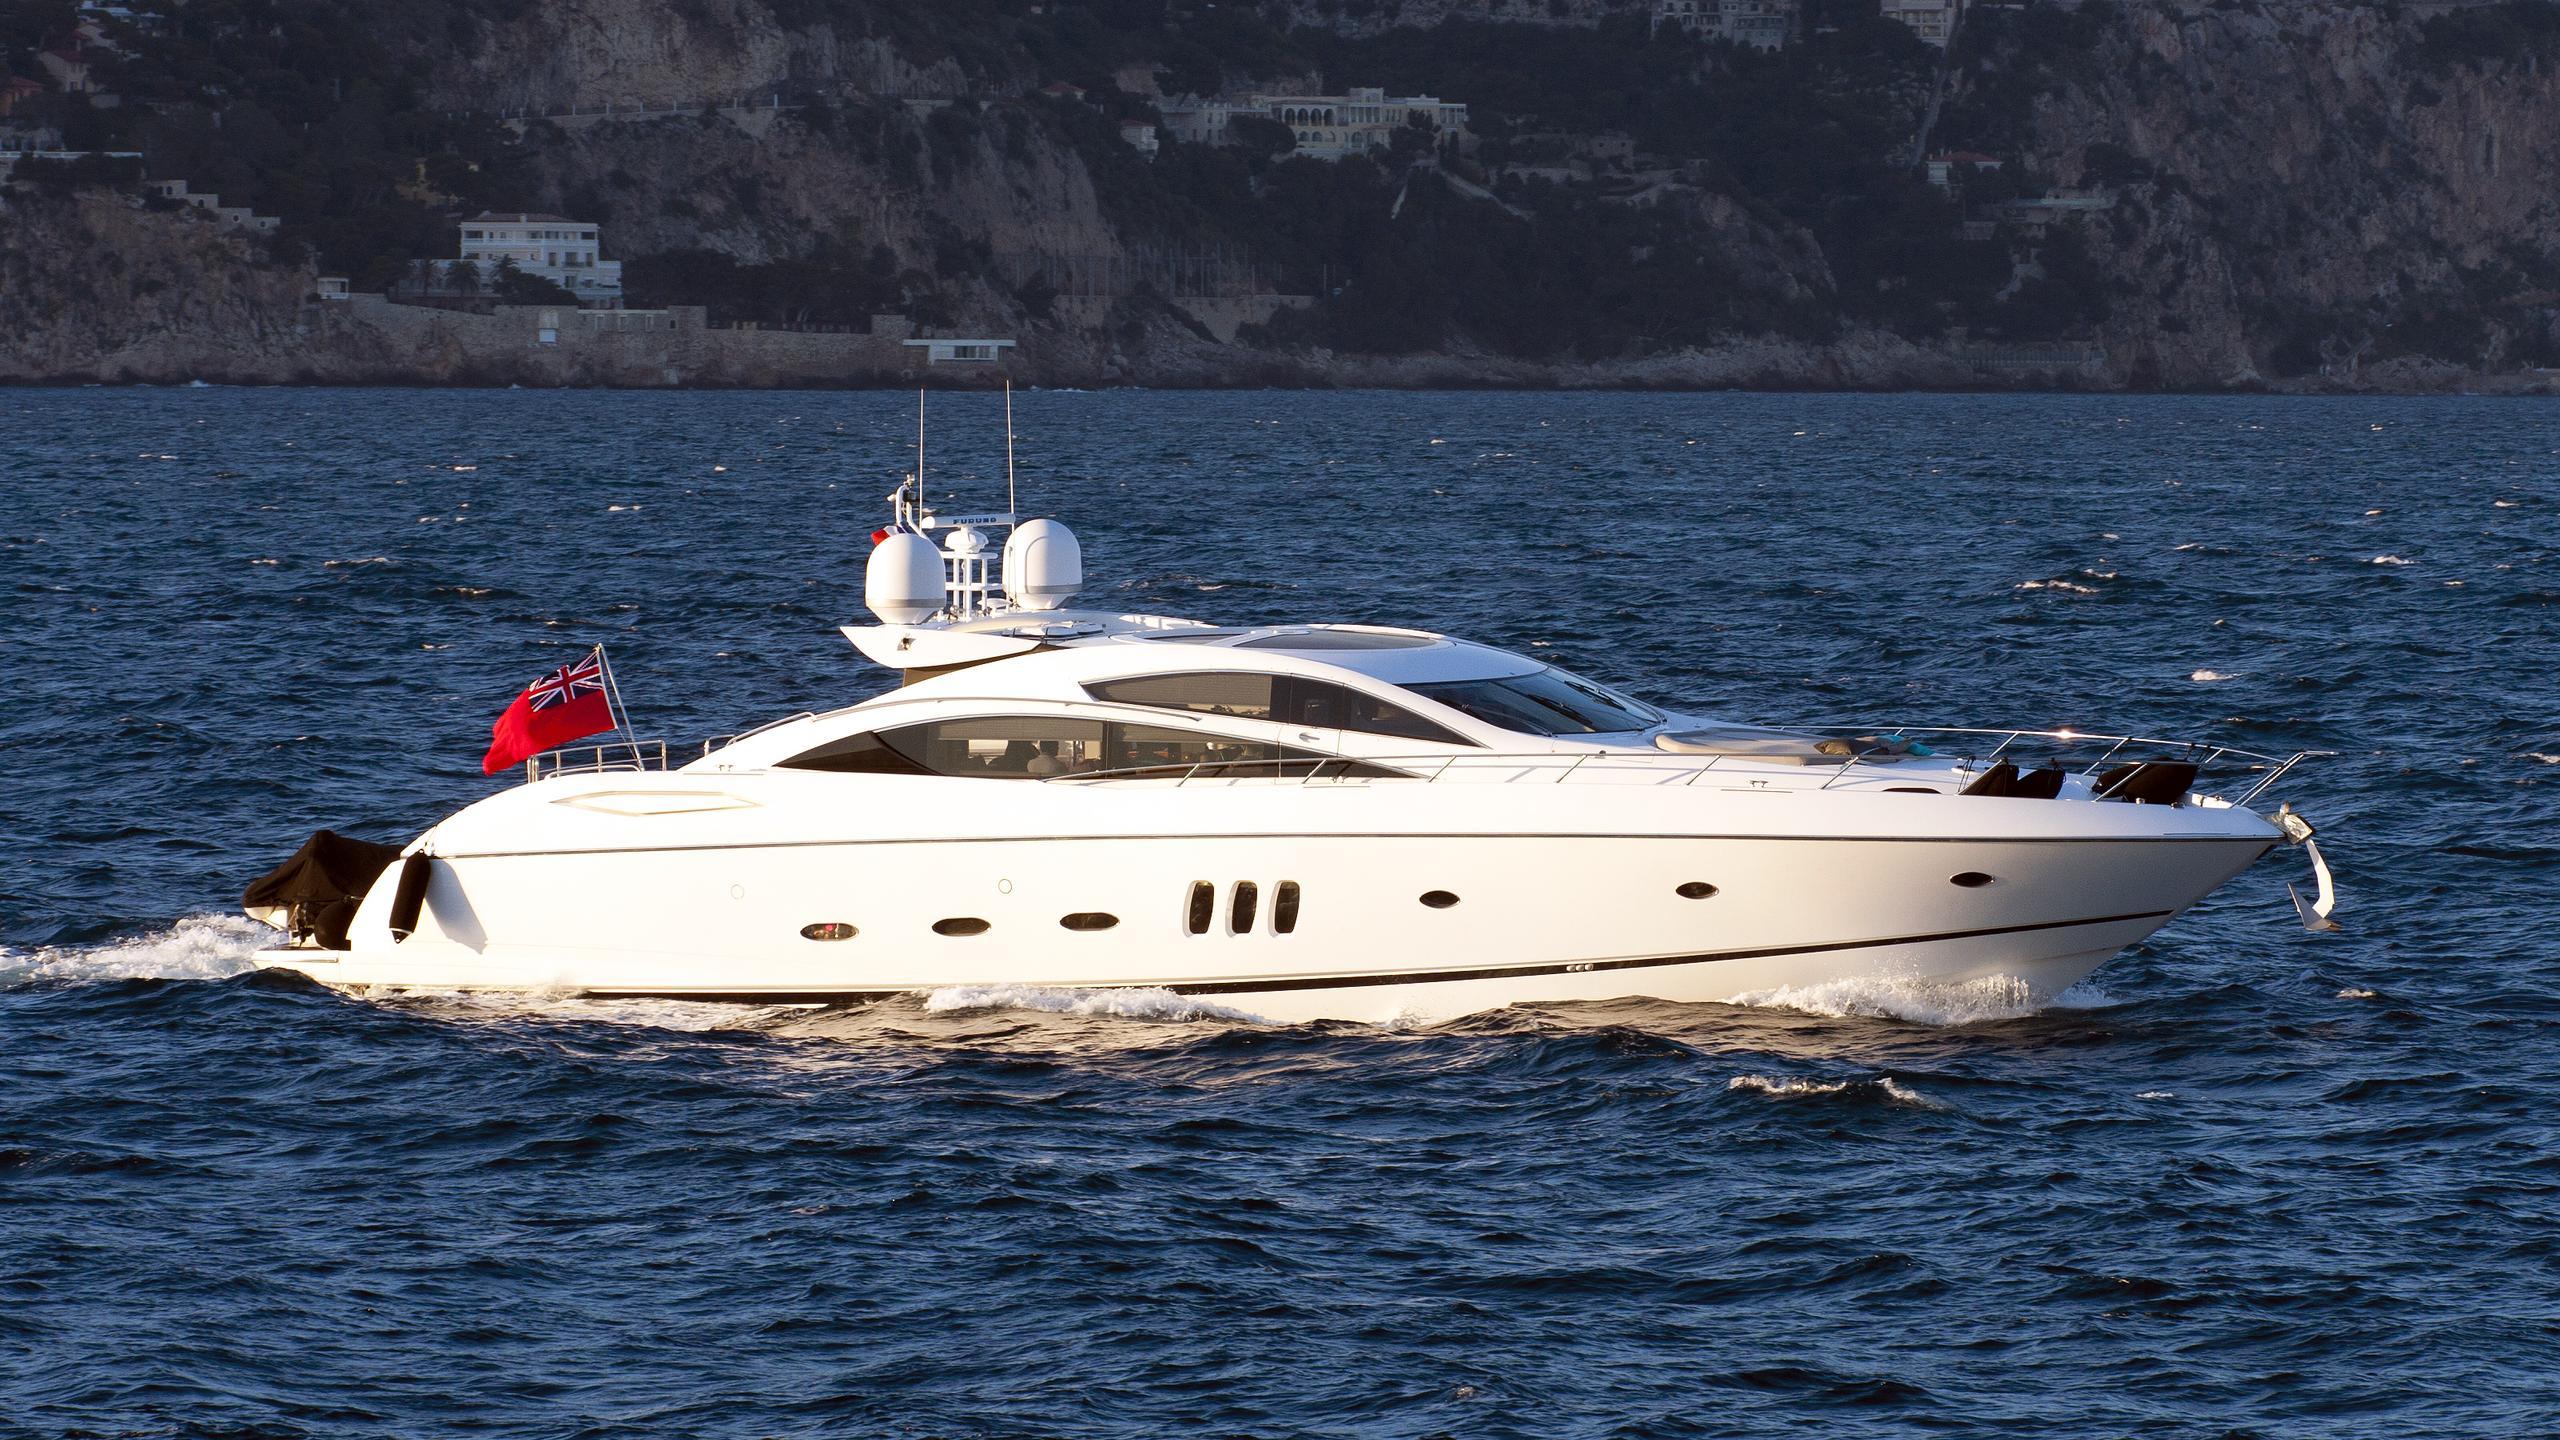 xdm-yacht-exterior